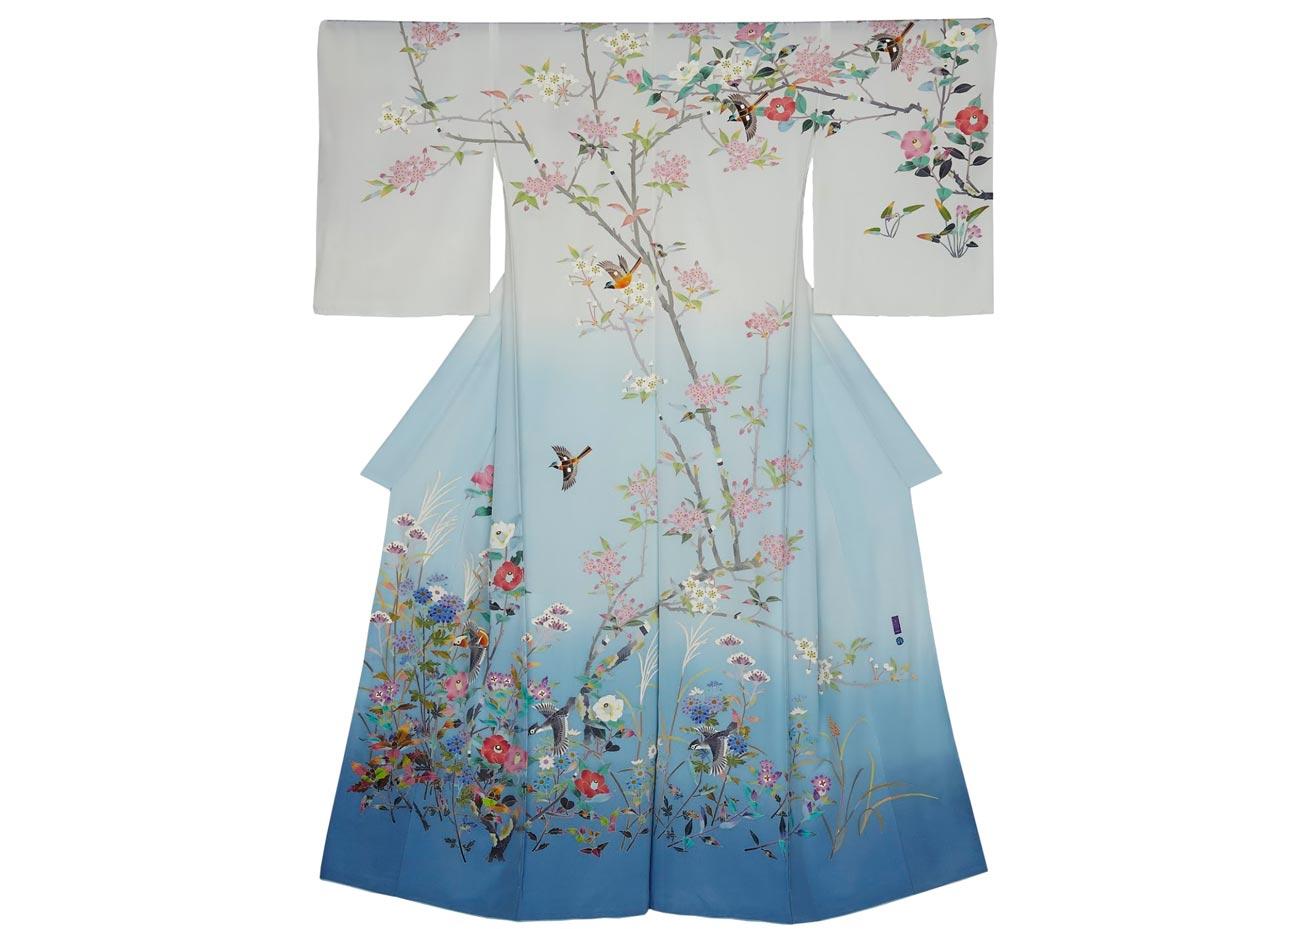 © Toshio Hyakkan, Cherry Blossom Kimono by Kaho Hyakkan